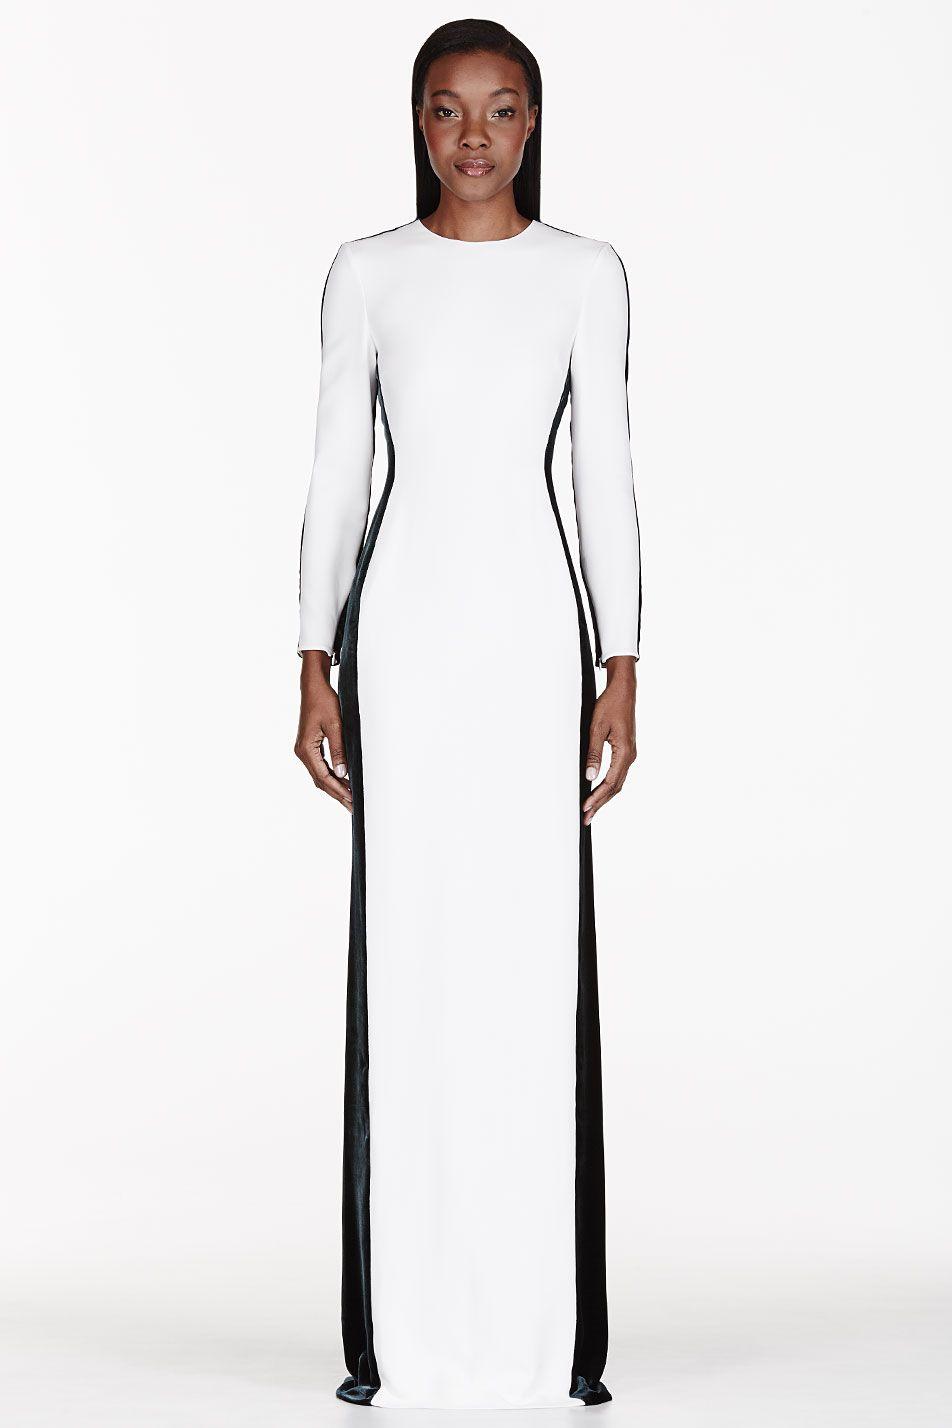 Stella Mccartney White Dark Green Panelled Dress Dresses Fashion Police Gowns Dresses [ 1428 x 952 Pixel ]